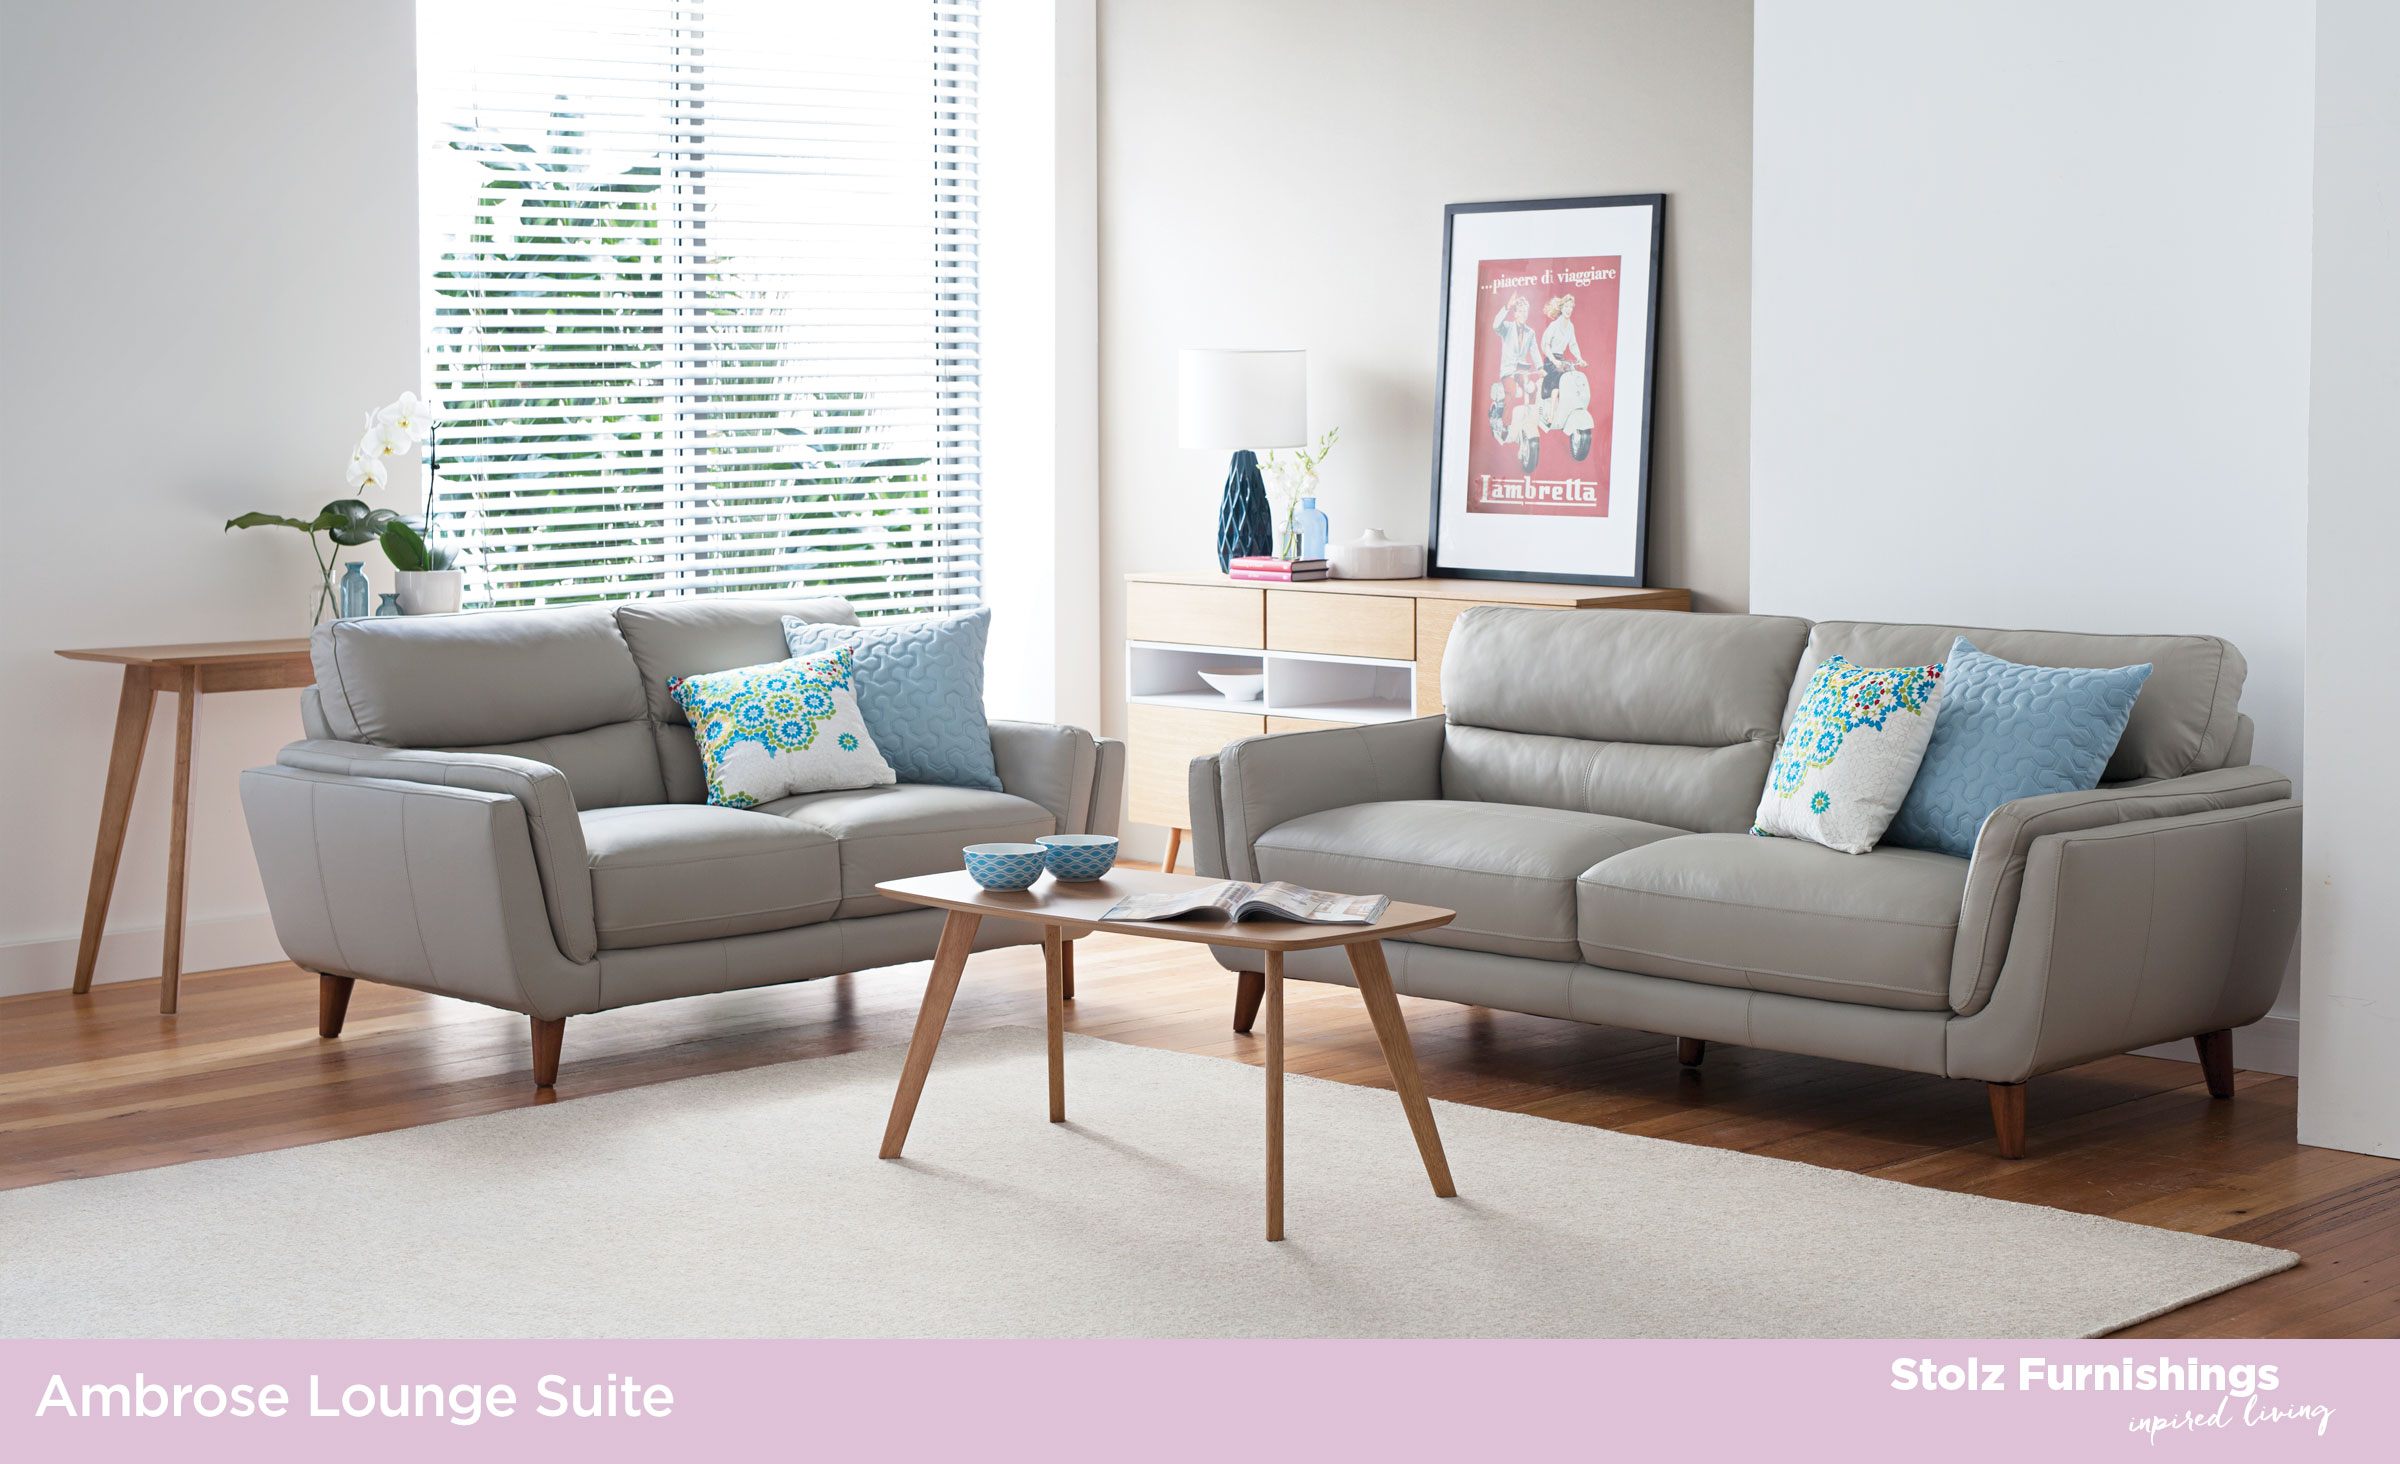 Ambrose Lounge Suite